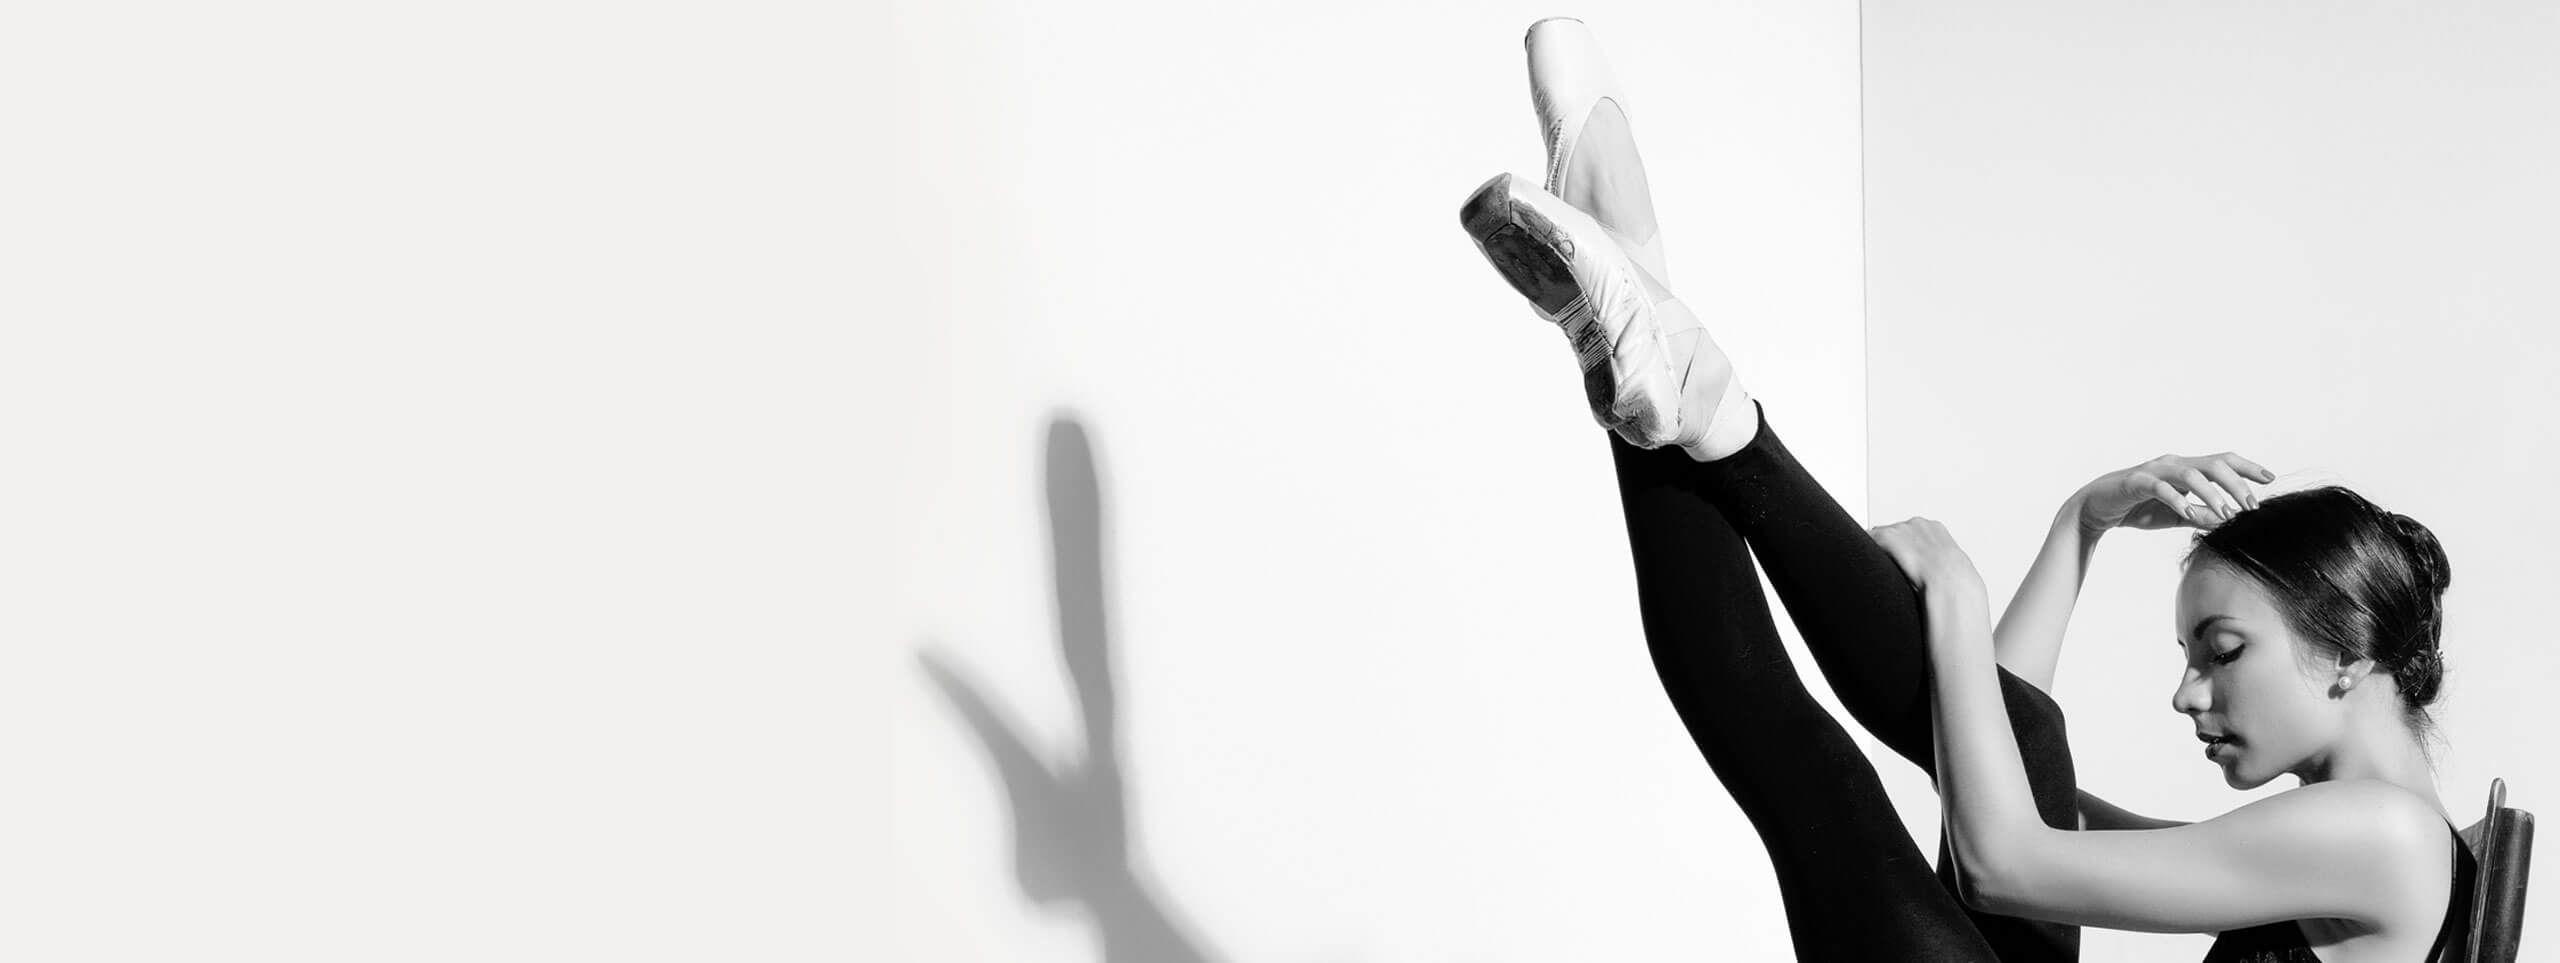 Acconciature resistenti: ballerina seduta su una sedia con acconciatura sportiva